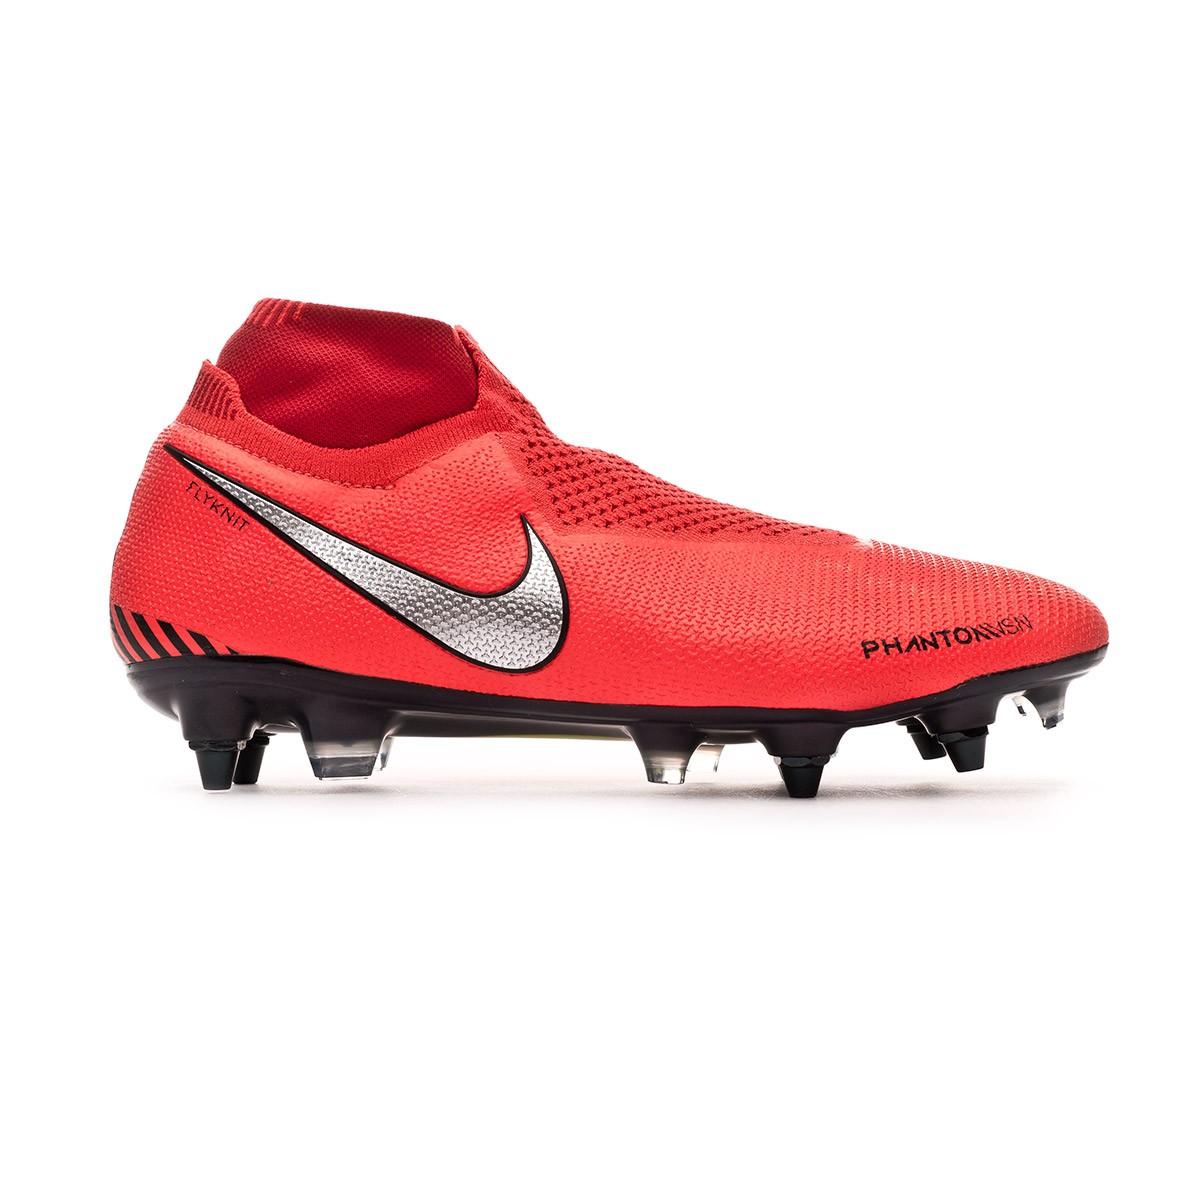 e6b33d92016c Football Boots Nike Phantom Vision Elite DF SG-Pro ACC Bright  crimson-Metallic silver - Football store Fútbol Emotion